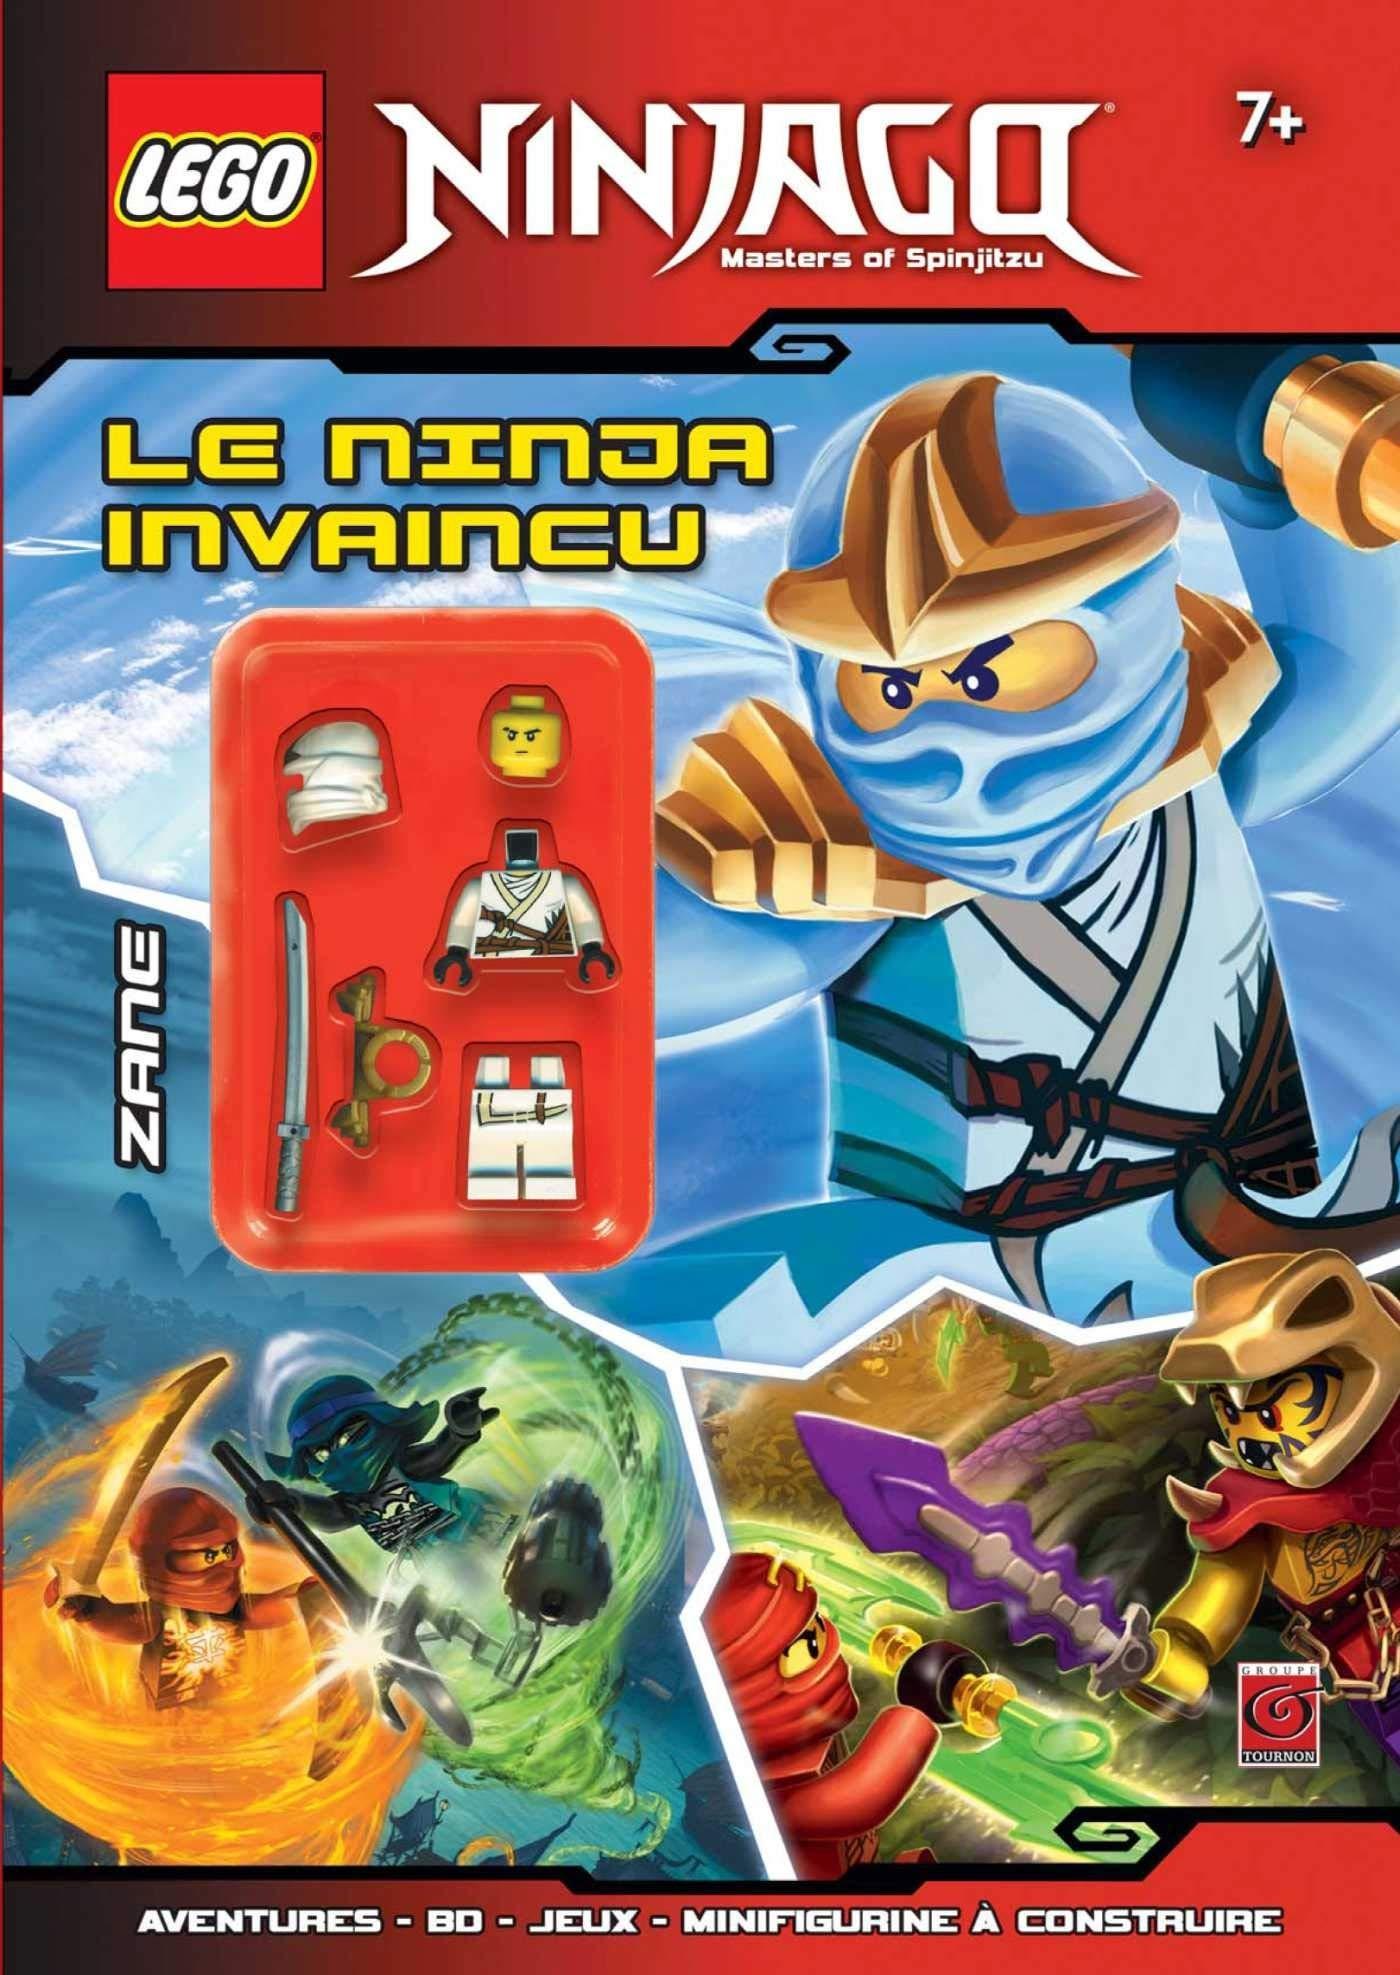 LEGO NINJAGO LE NINJA INVAINCU (TOURNON LEGO): Amazon.es ...